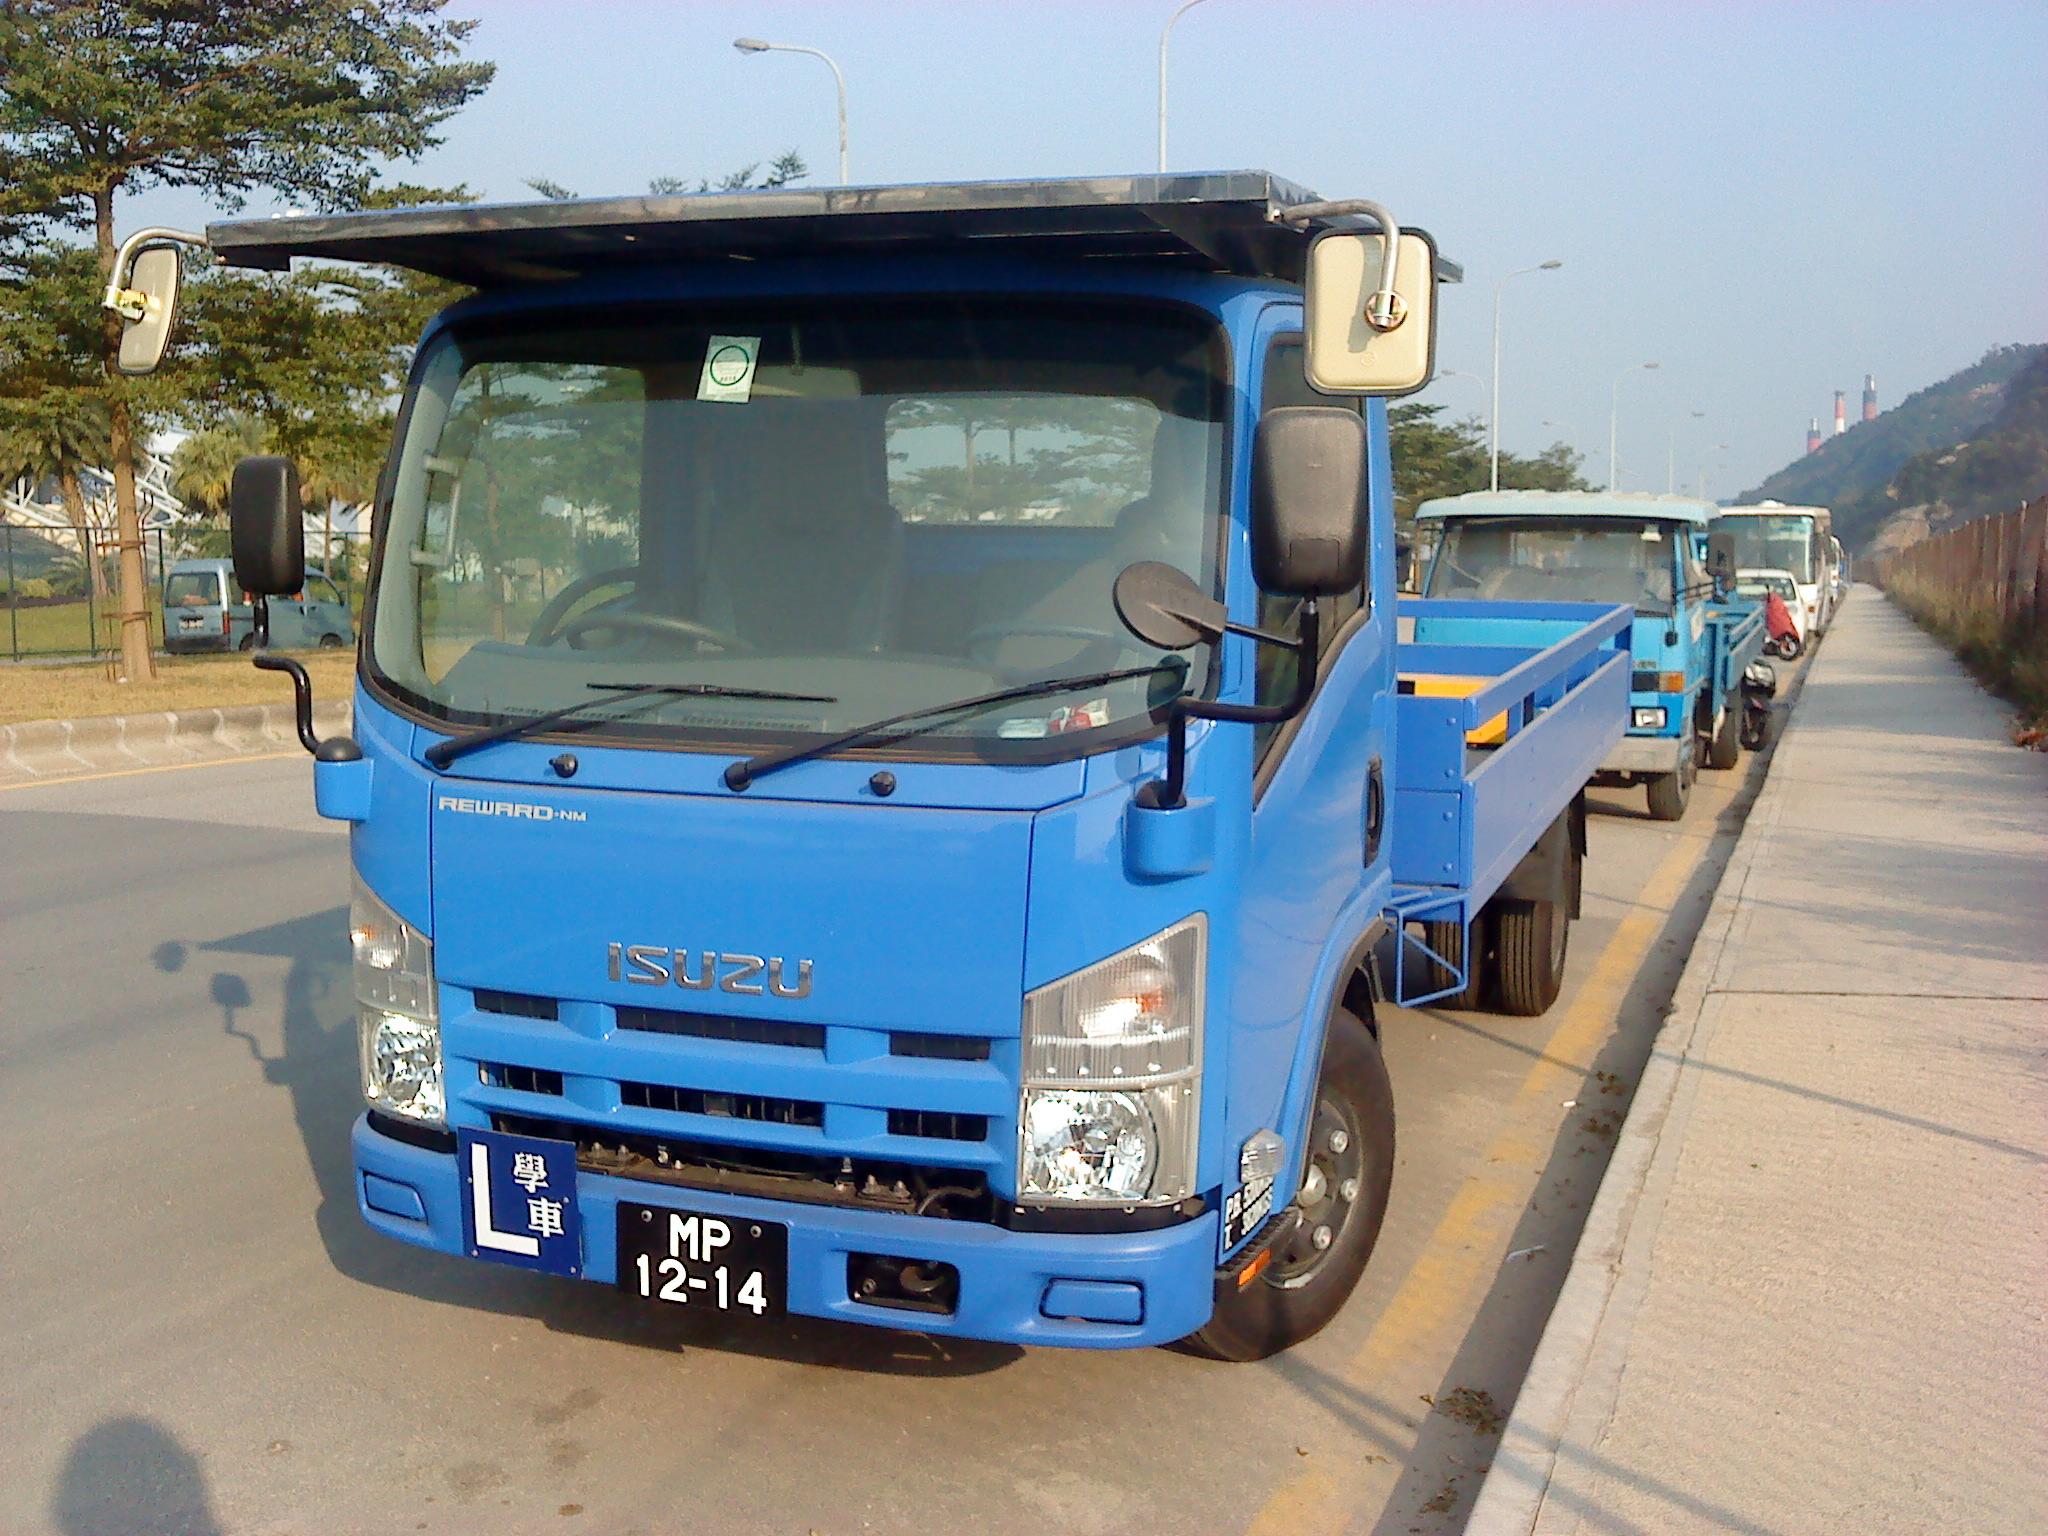 Edit 日本語: マカオのいすゞ・エルフ(輸出通称:REWARD)NMRシリーズ教習車(大型ト